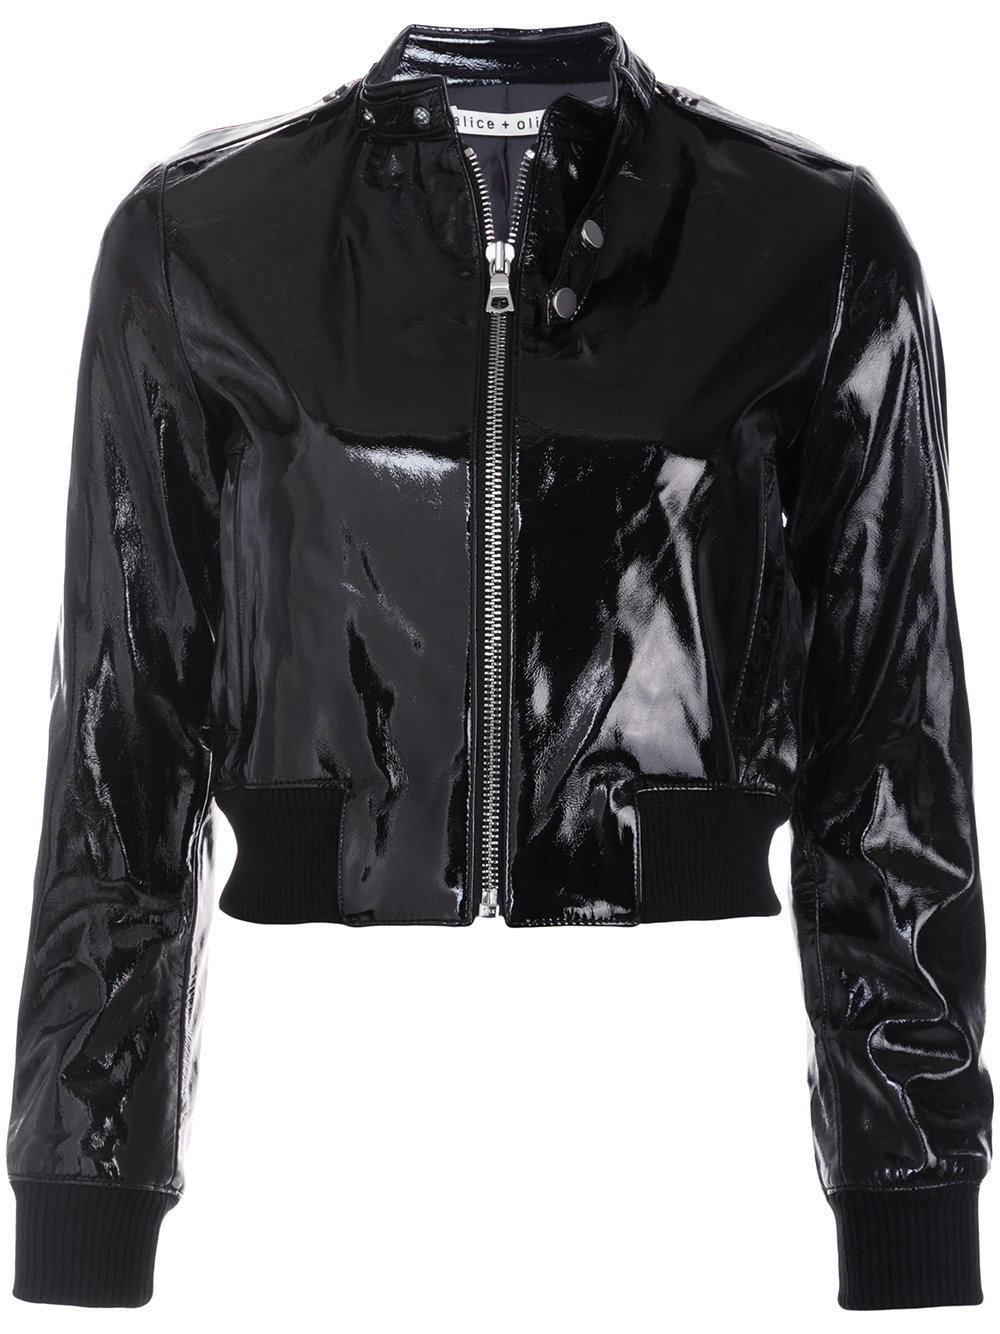 ALICE+OLIVIA jacket - $895